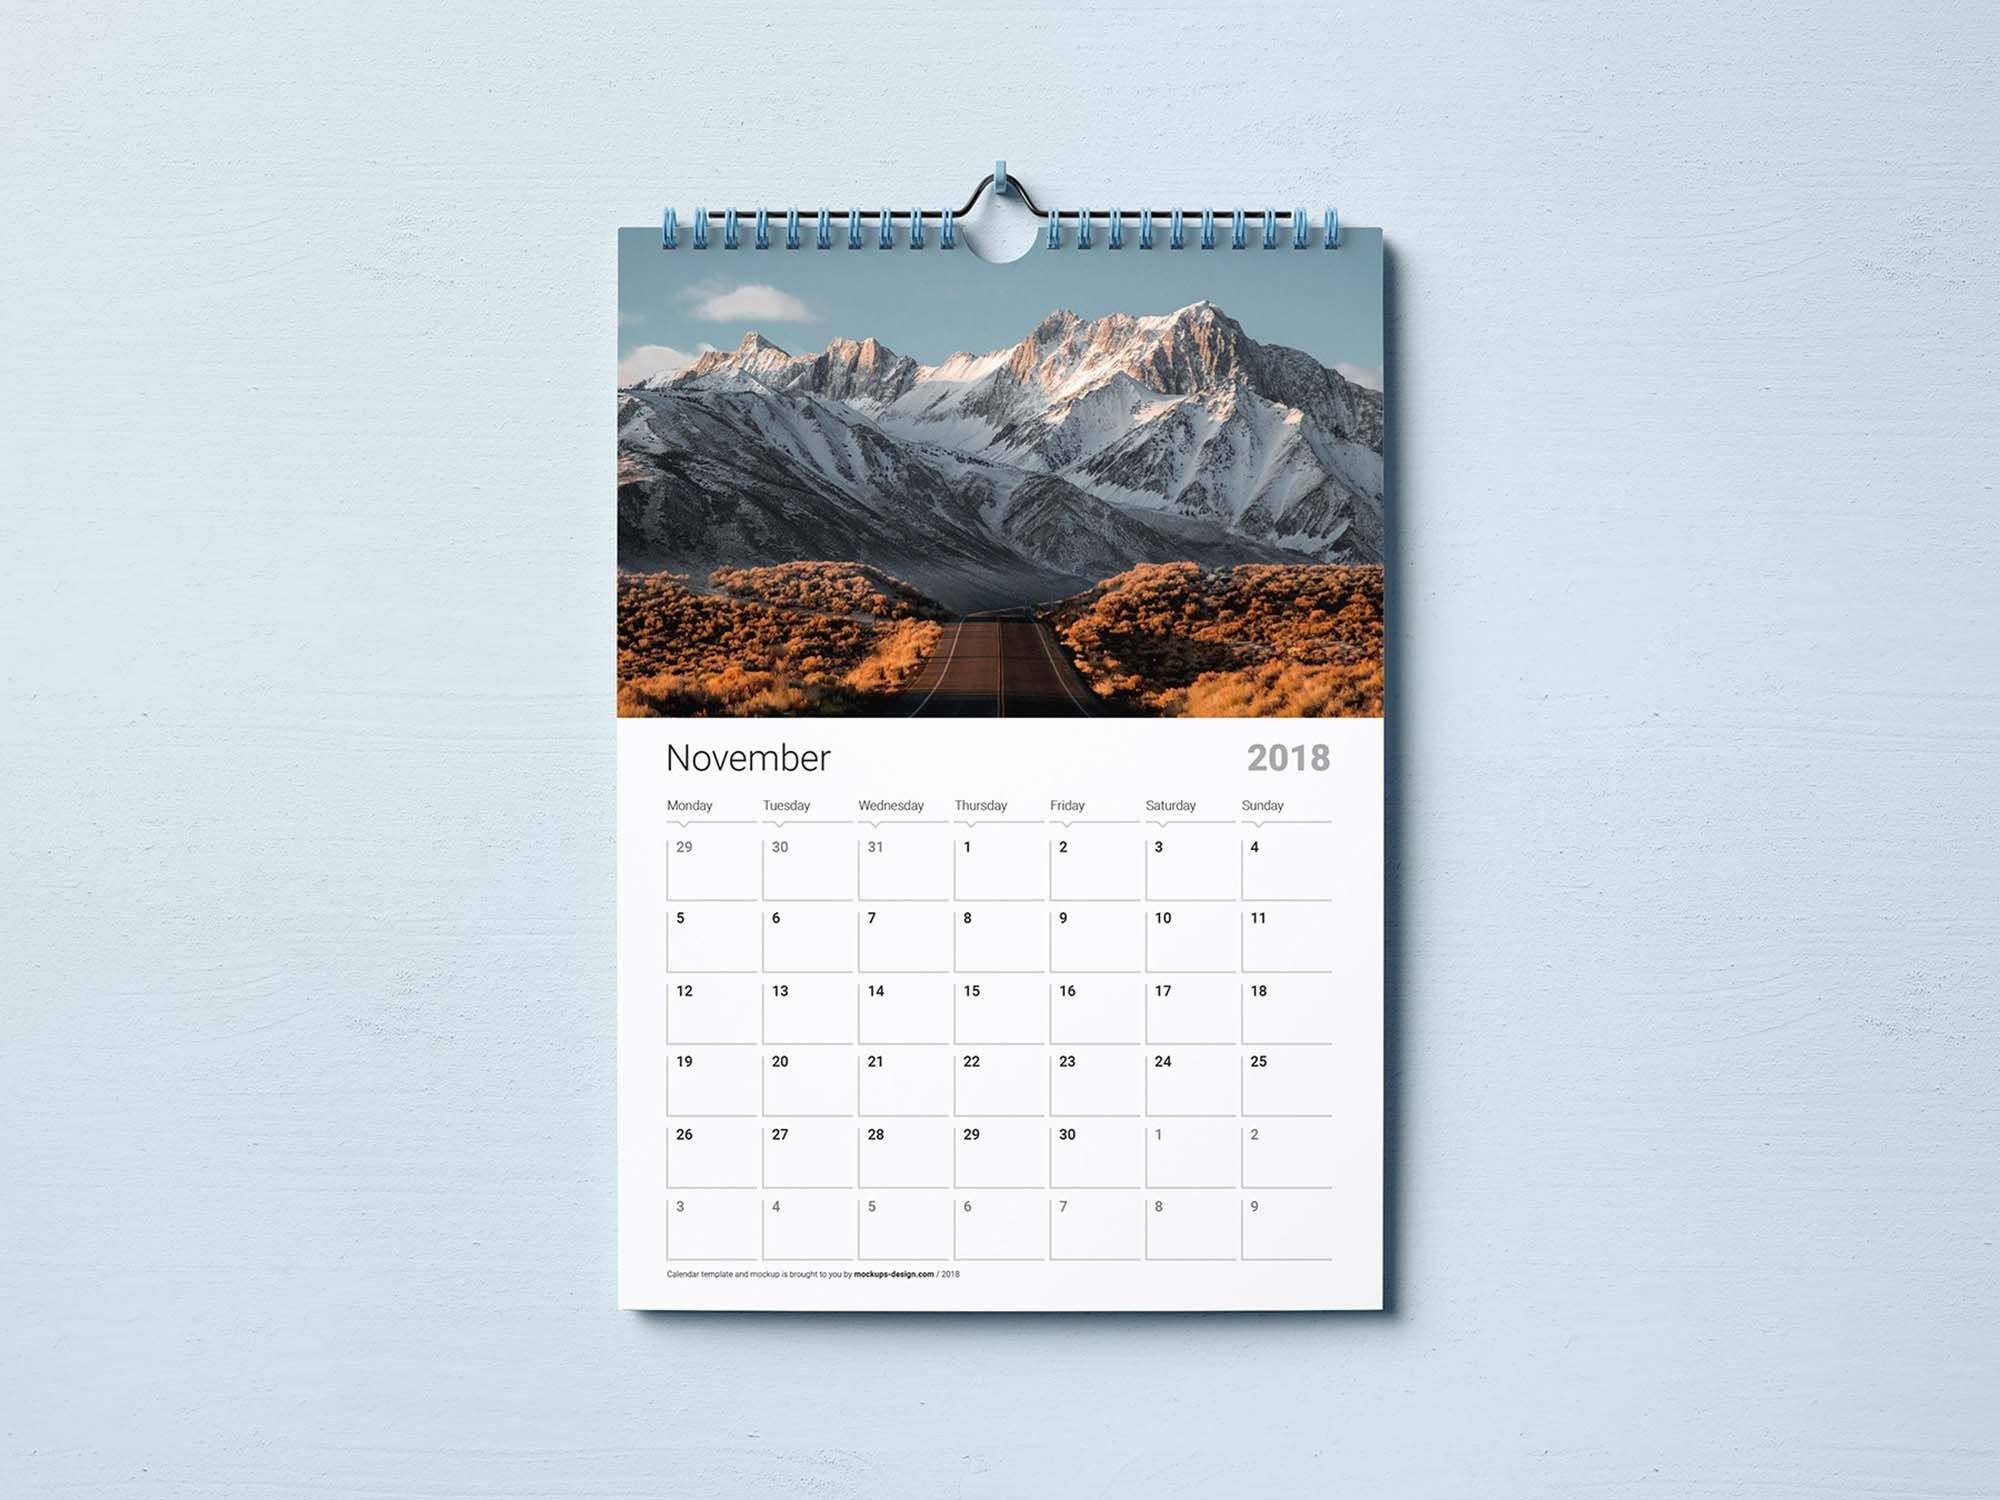 Free Wall Calendar Mockup & Template (Psd) | Mock Up Calendar 2019 Template Psd